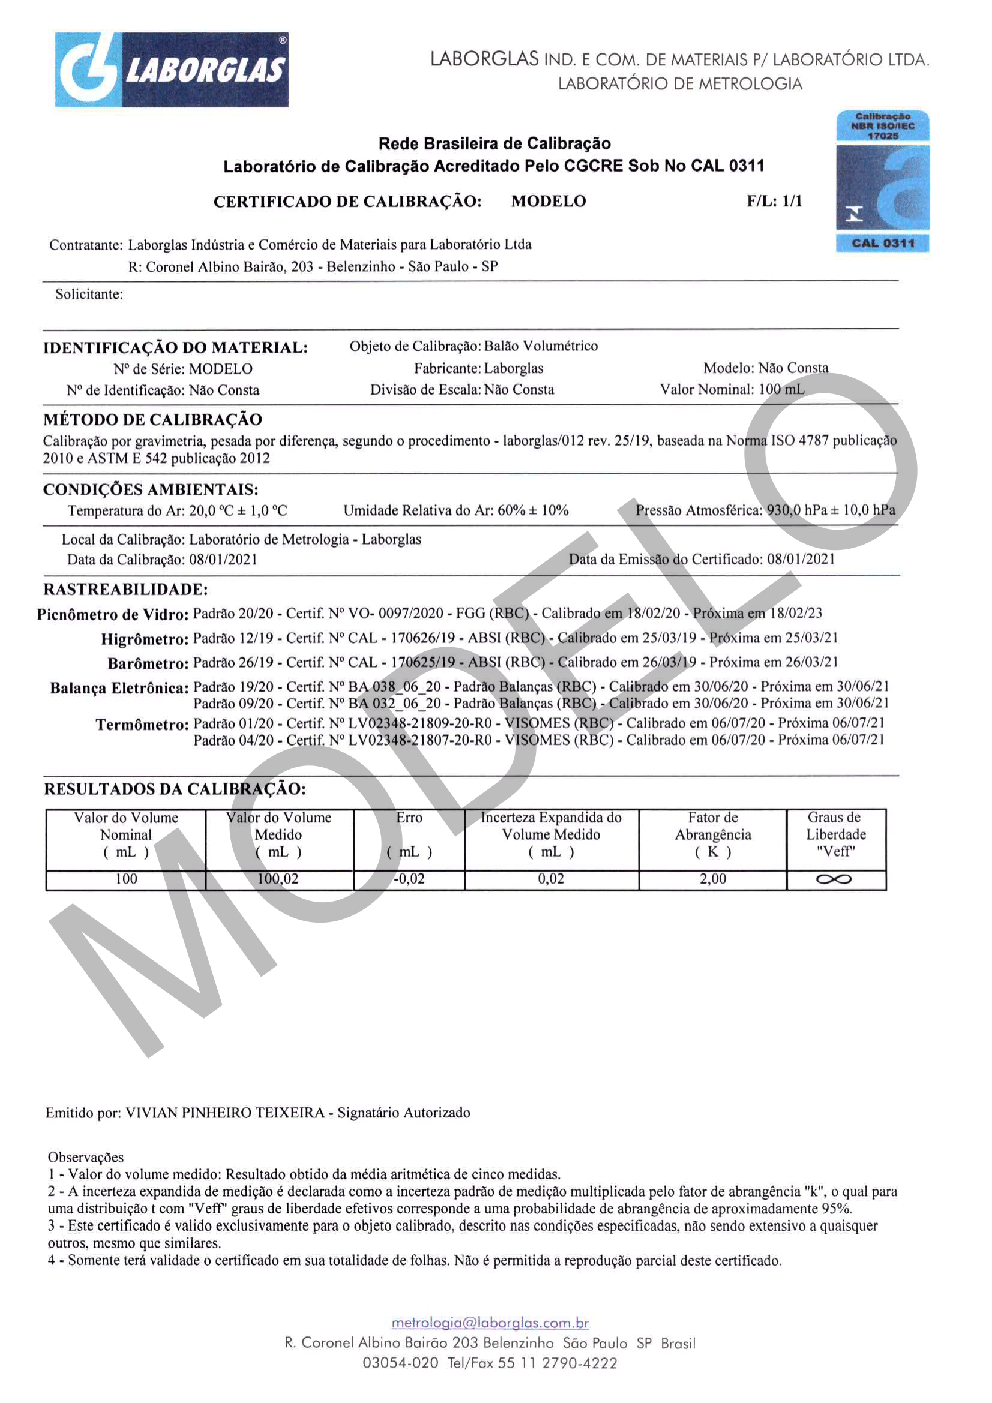 BALÃO VOLUMÉTRICO CLASSE A ROLHA POLI C/ CERTIFICADO RBC 30 ML - Marca Laborglas - Cód. 9167815-R